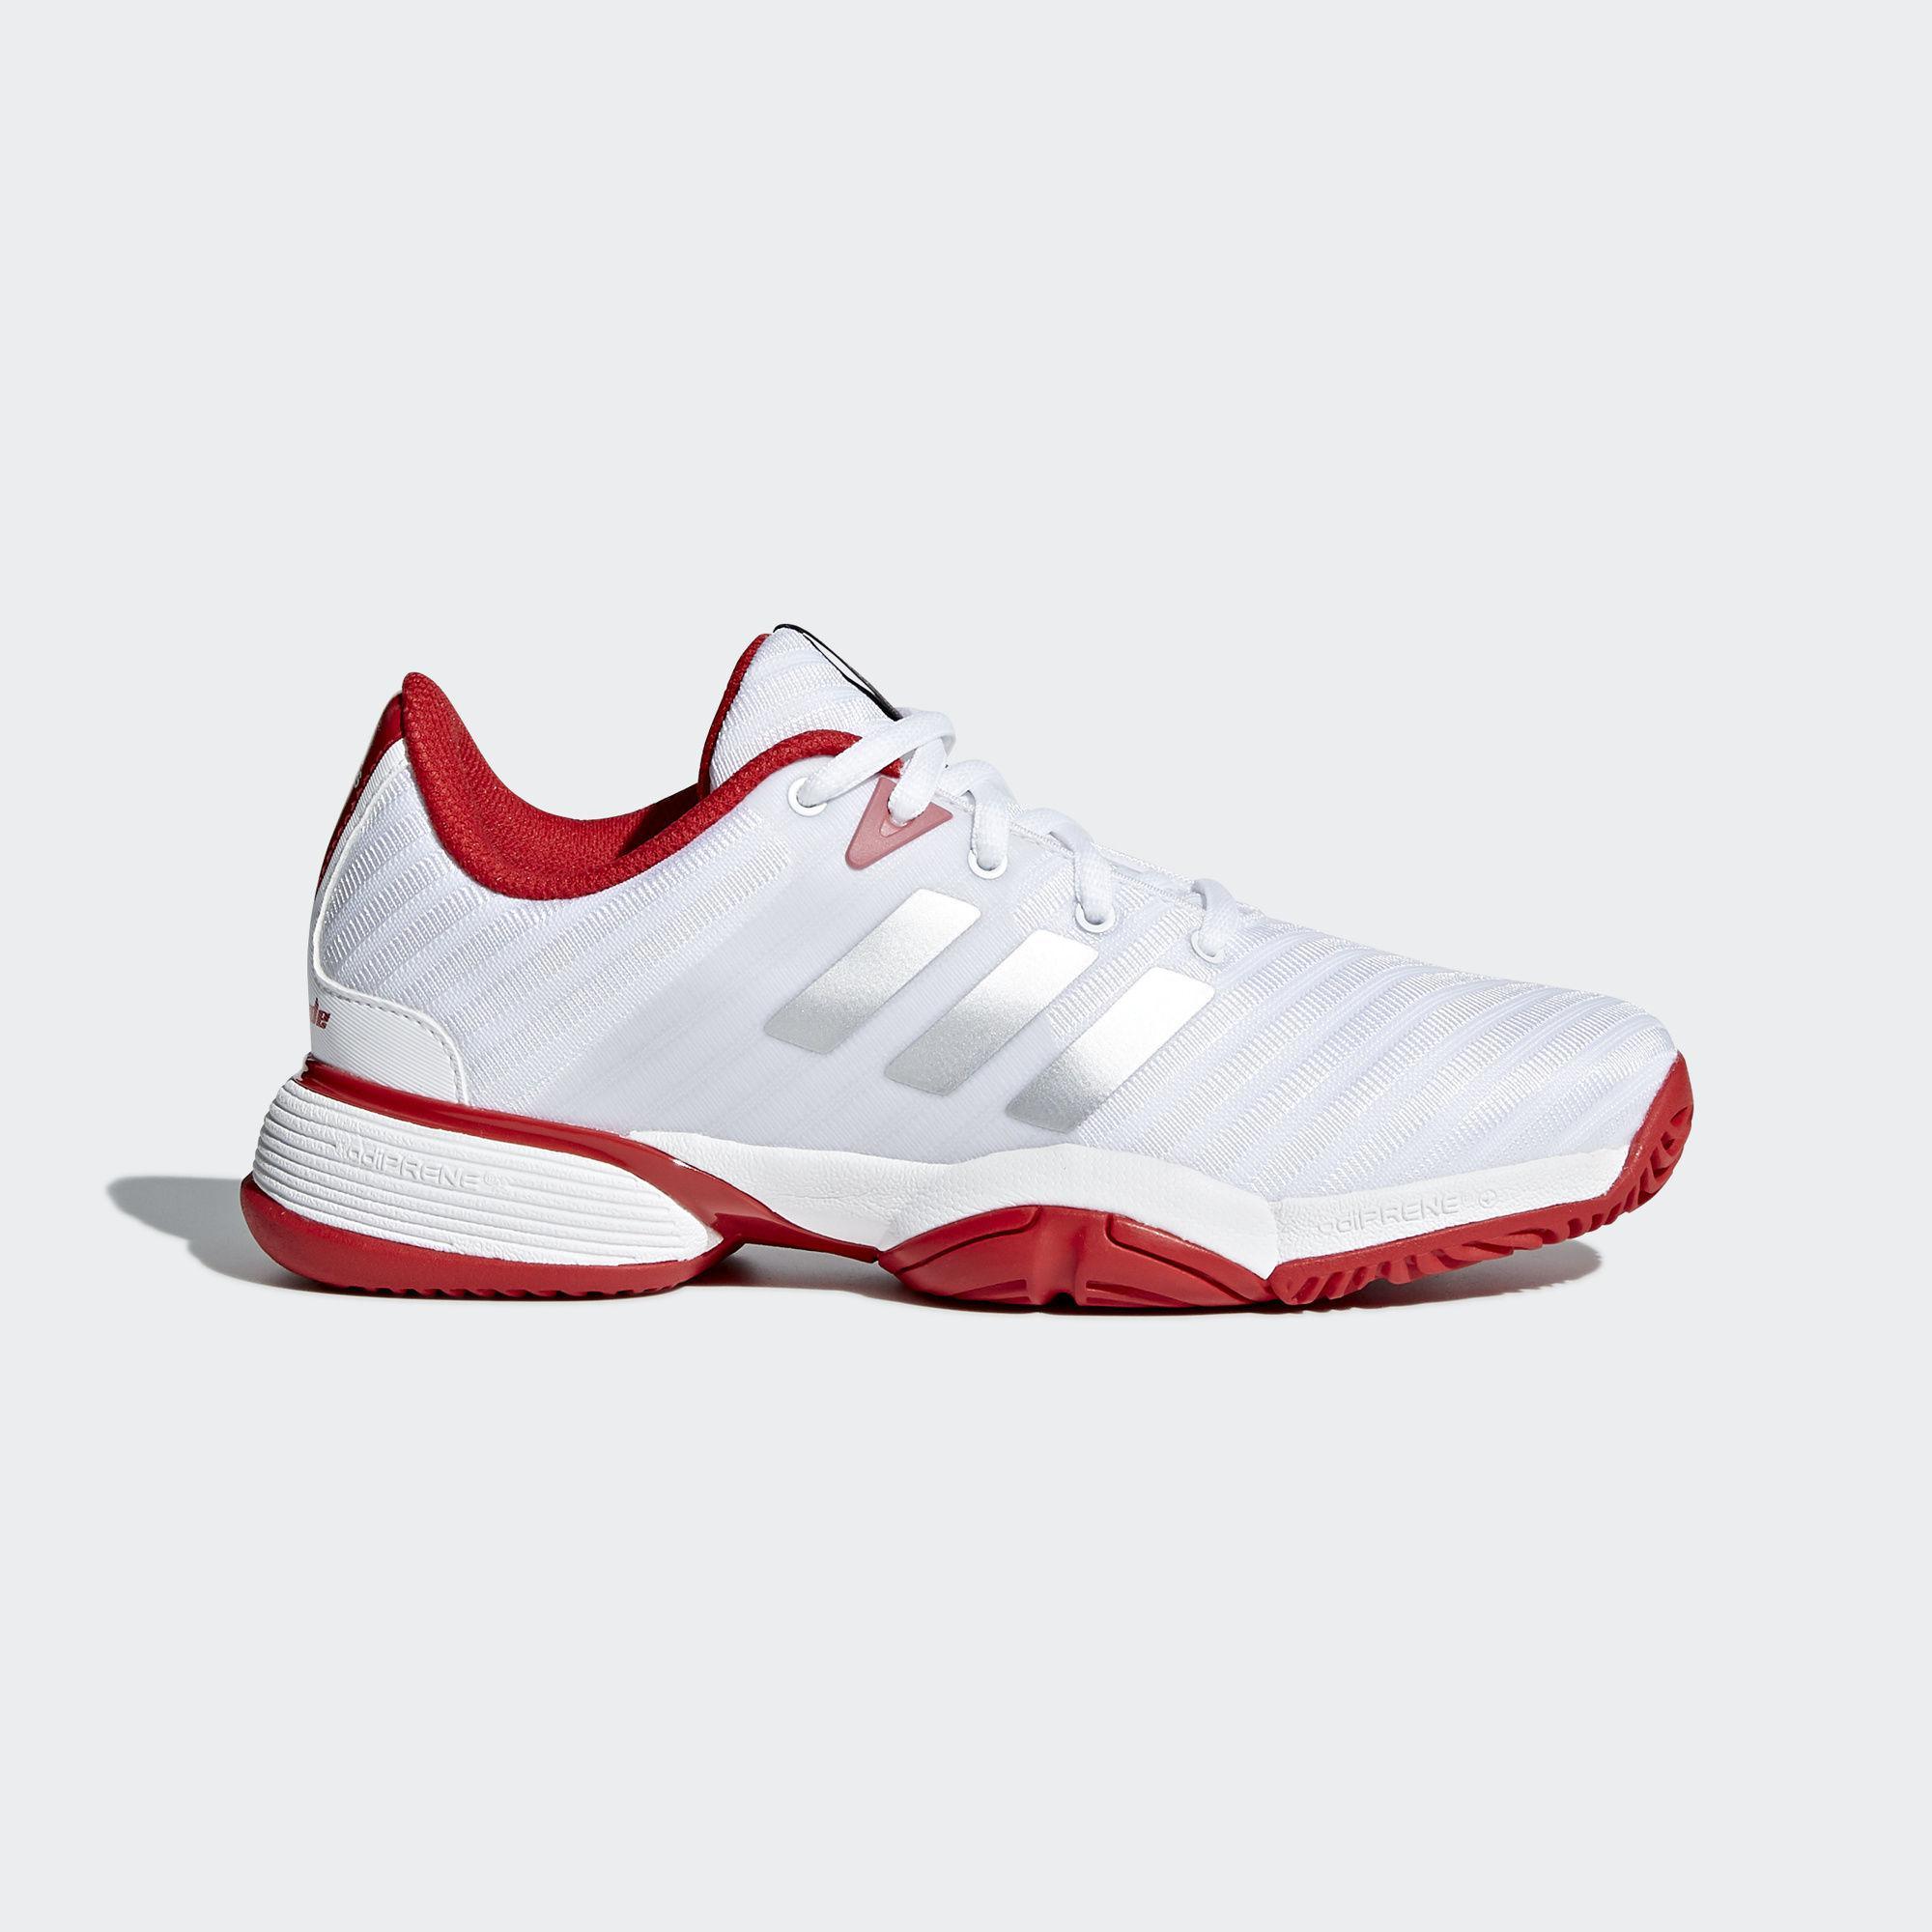 Adidas Kids Barricade 2018 Tennis Shoes